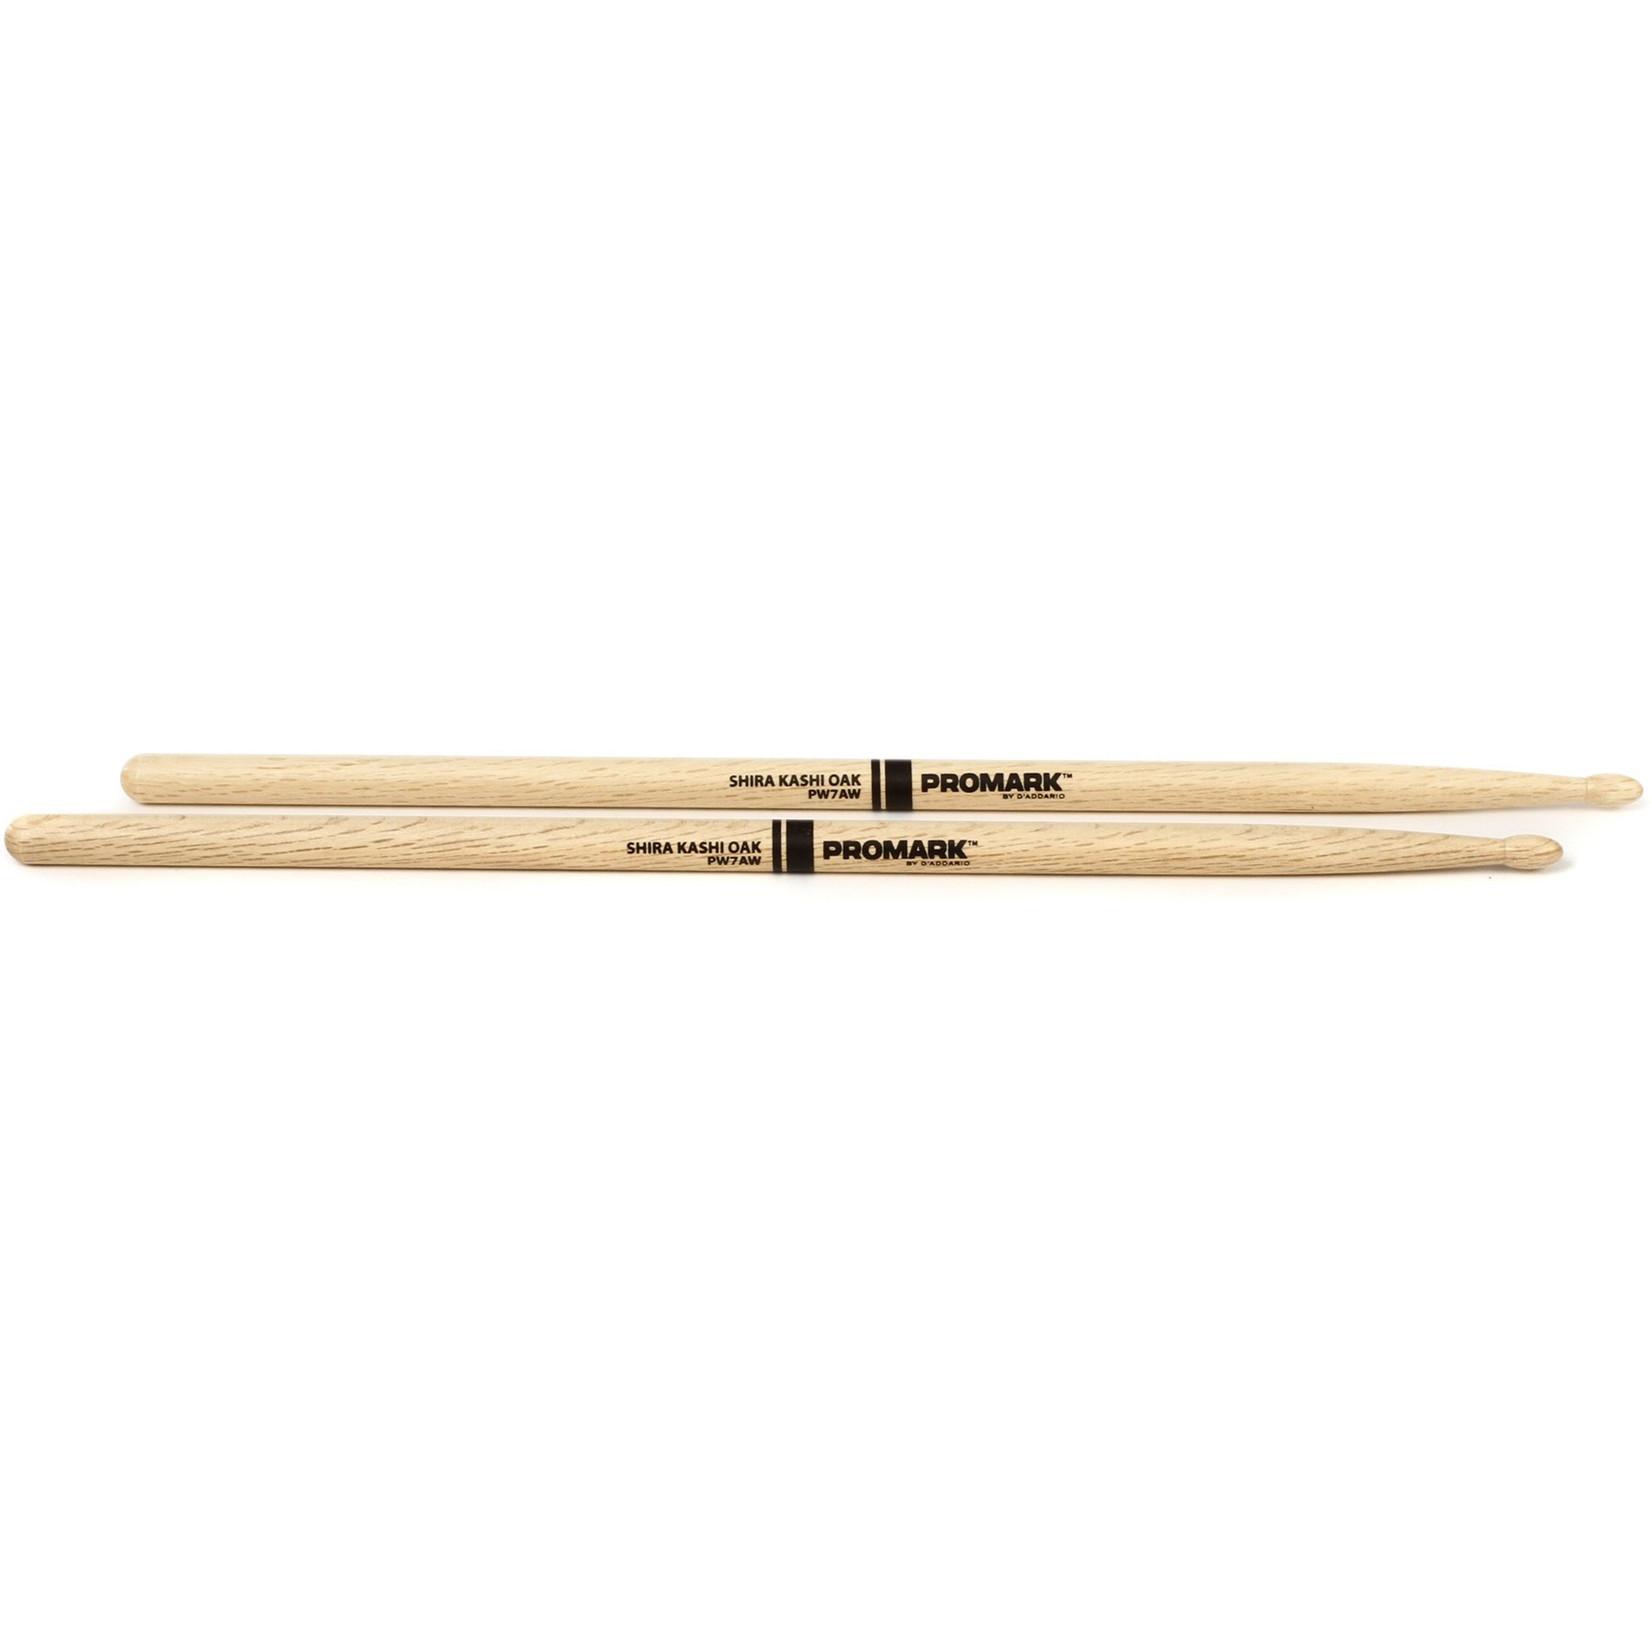 Promark ProMark Classic Shira Kashi Oak Attack 7A Wood Tip Drumstick